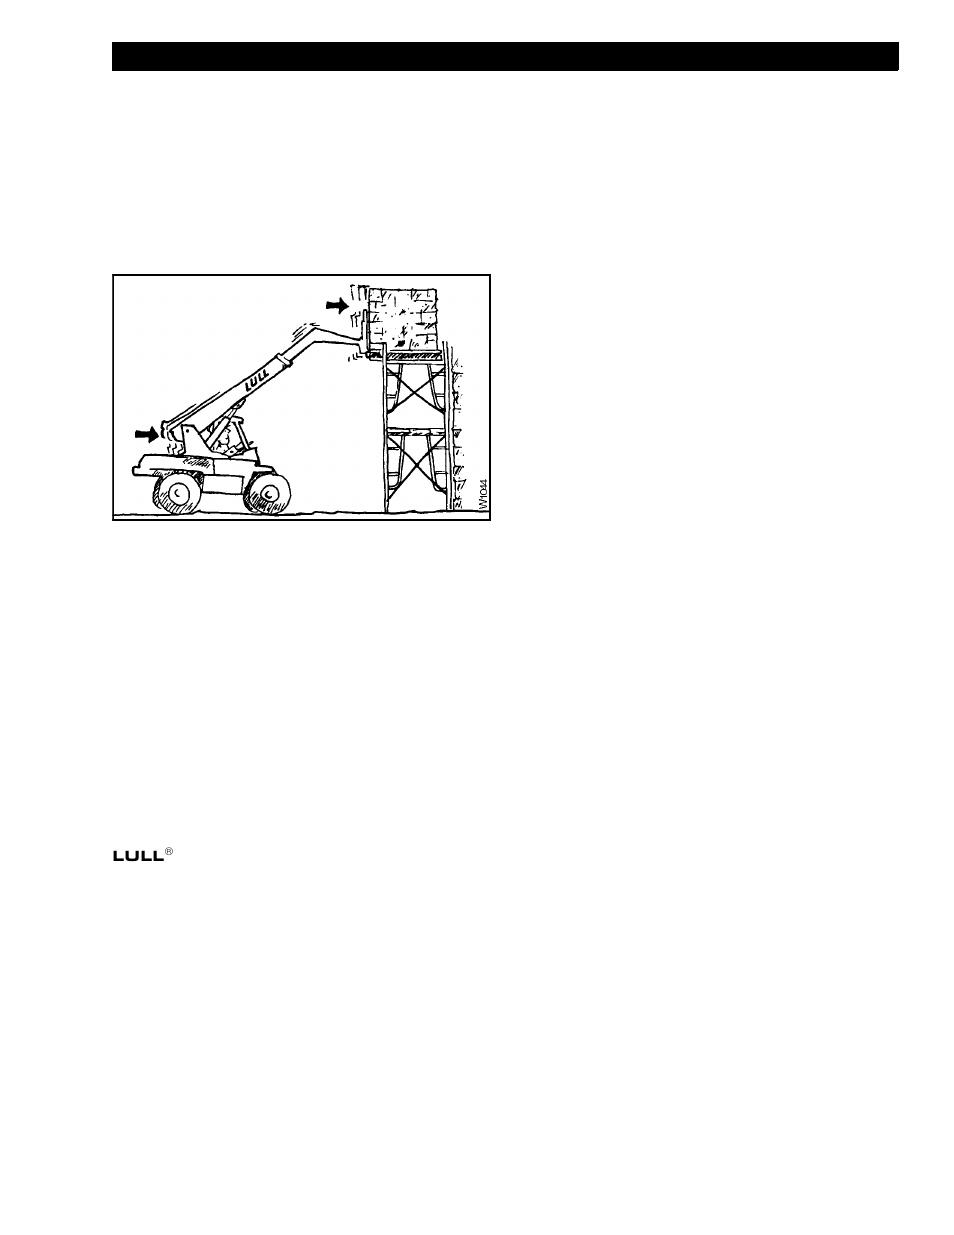 Lull Wiring Diagram Explained Diagrams Bomag 644b 42 Honda Motorcycle Repair Wire